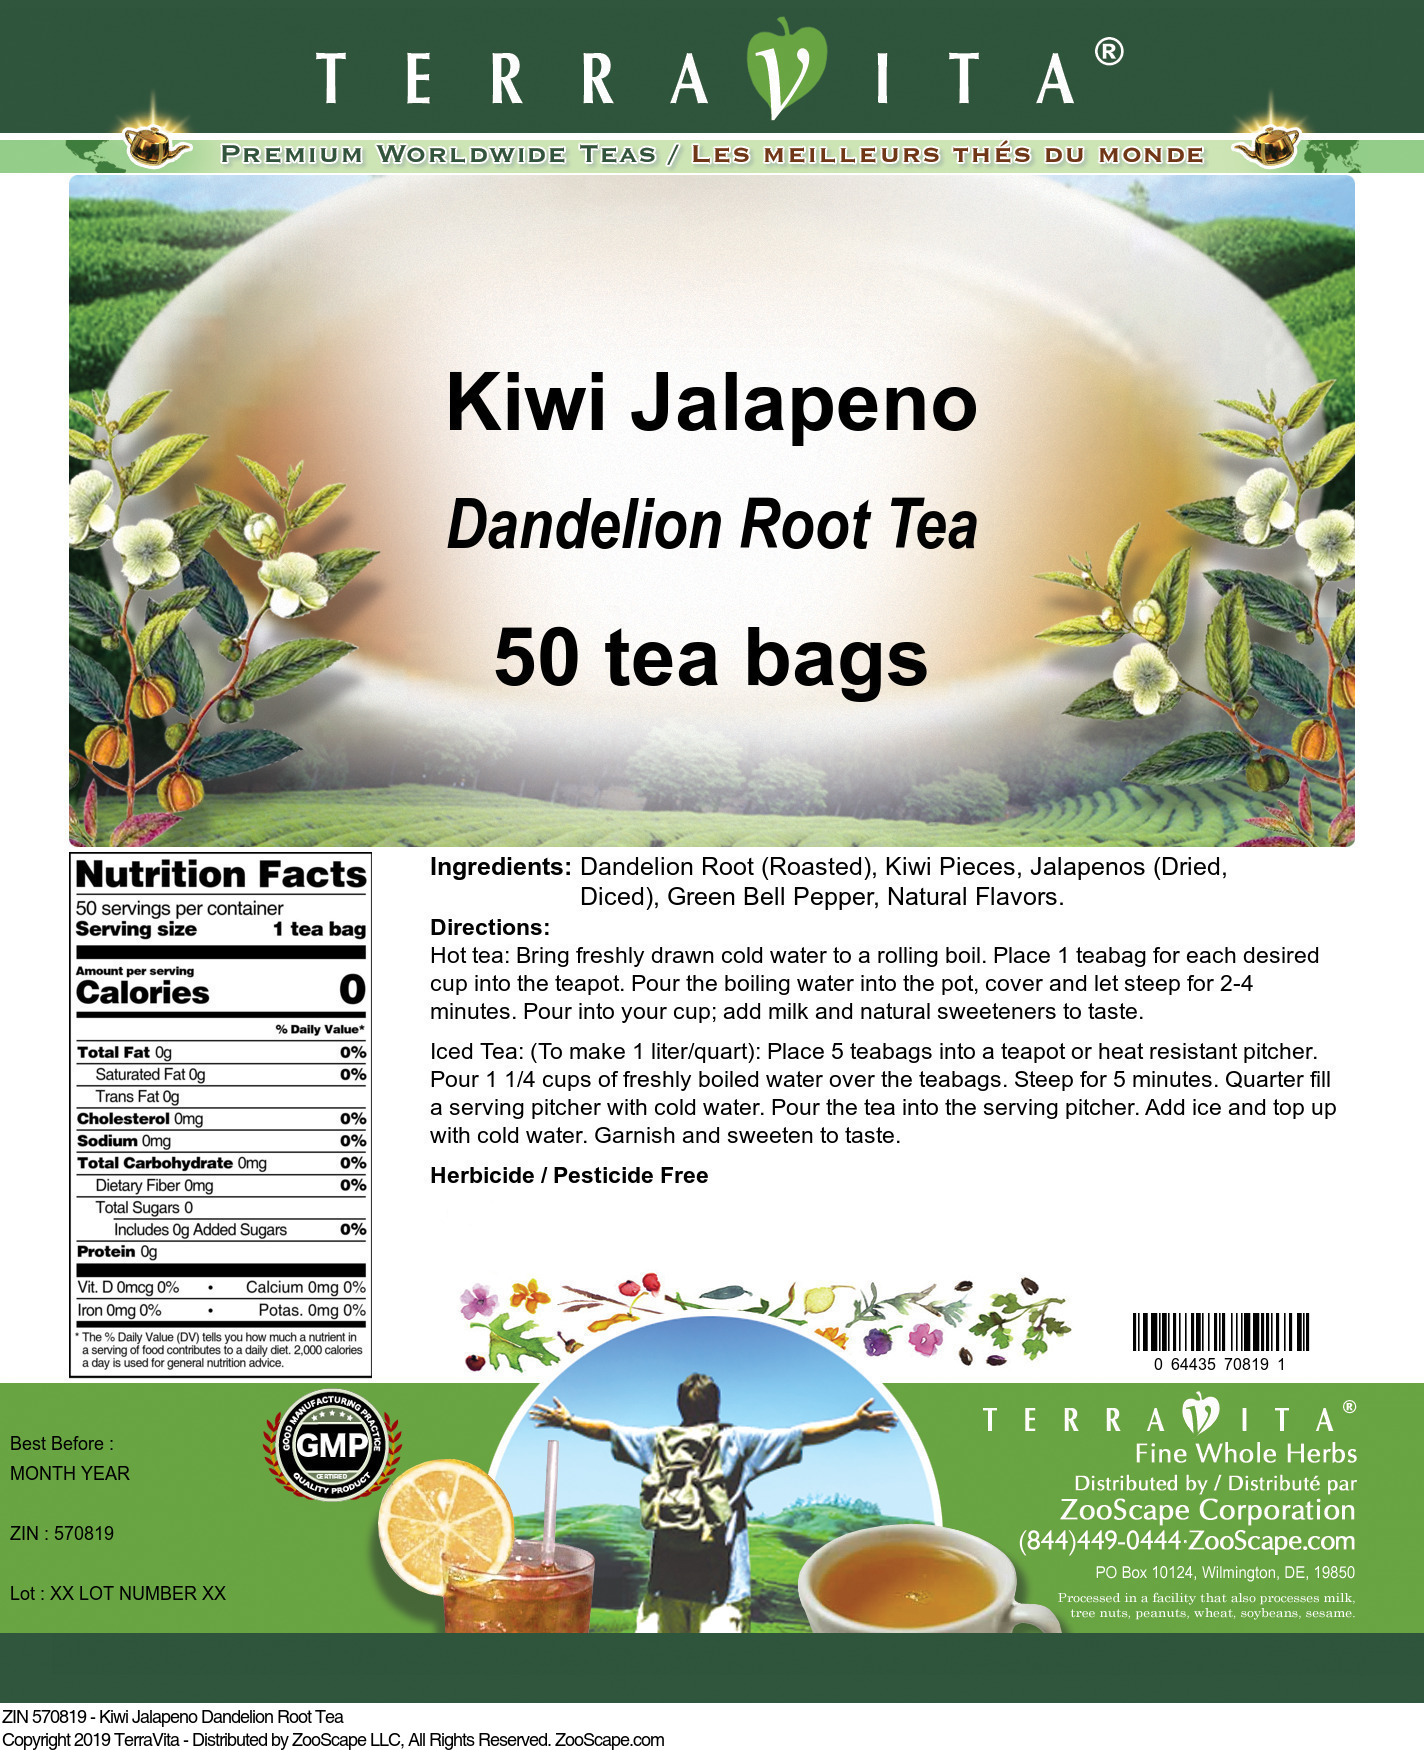 Kiwi Jalapeno Dandelion Root Tea